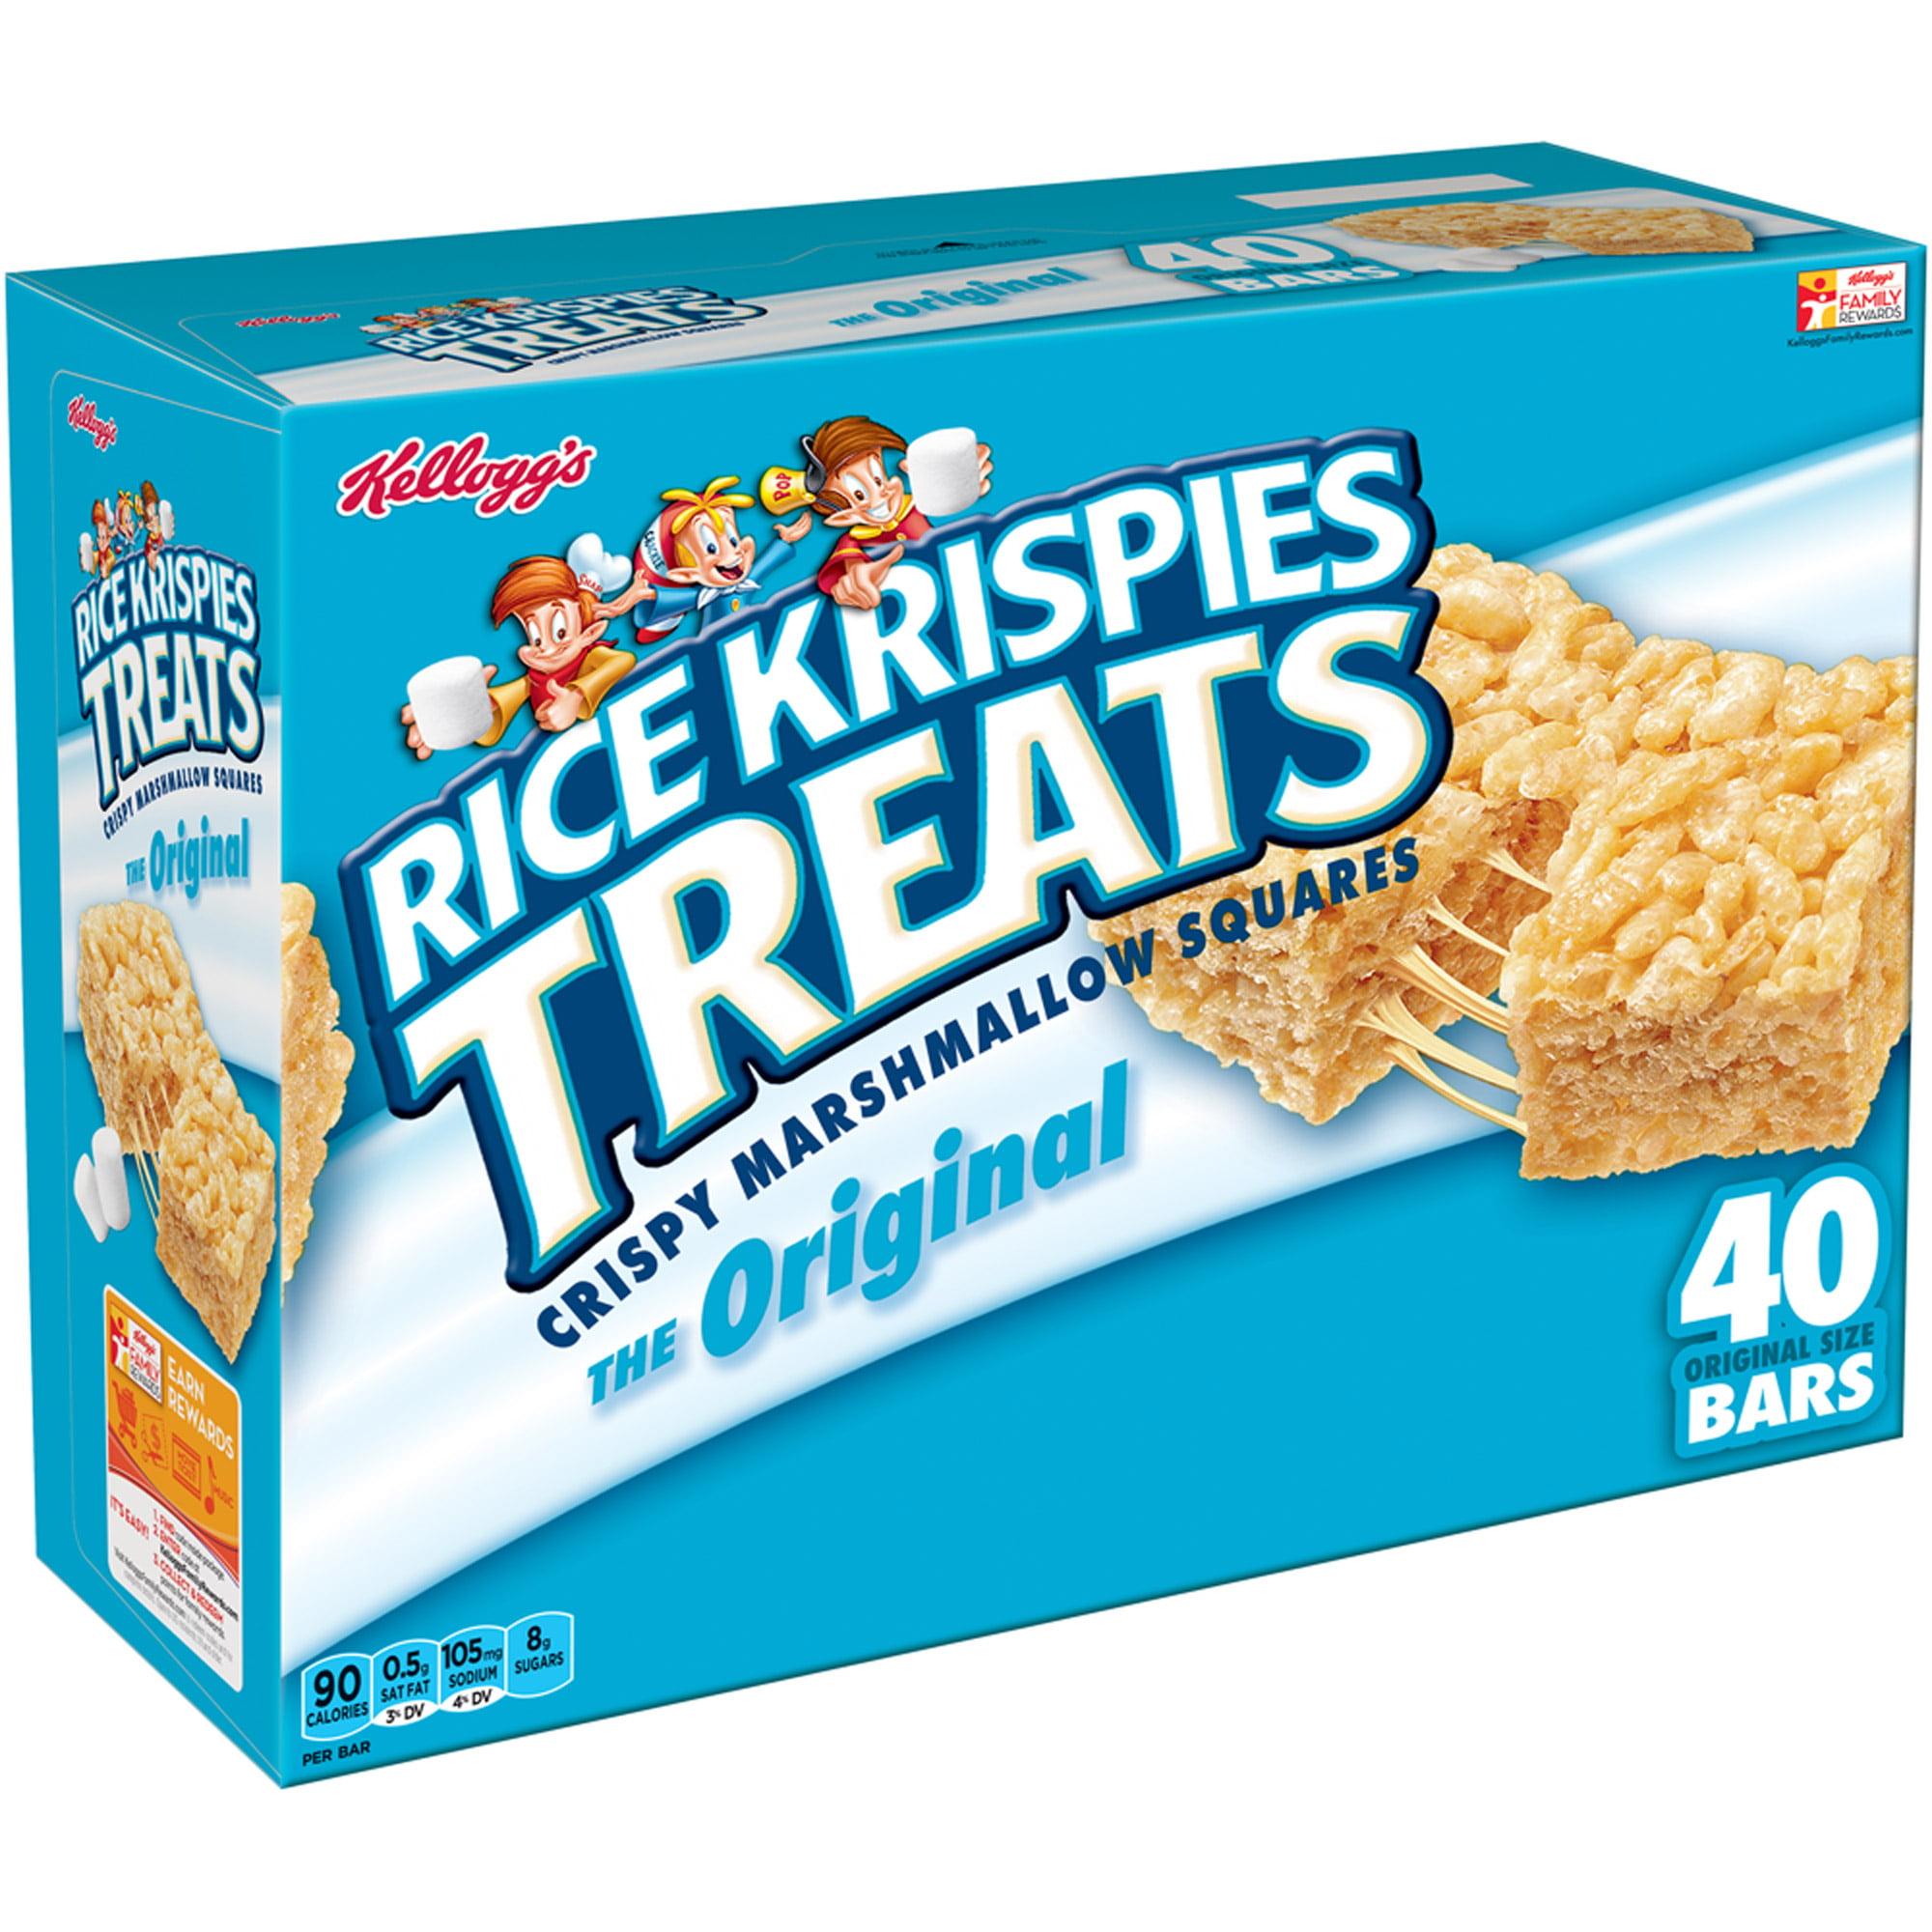 Kellogg's Rice Krispies Treats Marshmallow Squares 31.2 Oz